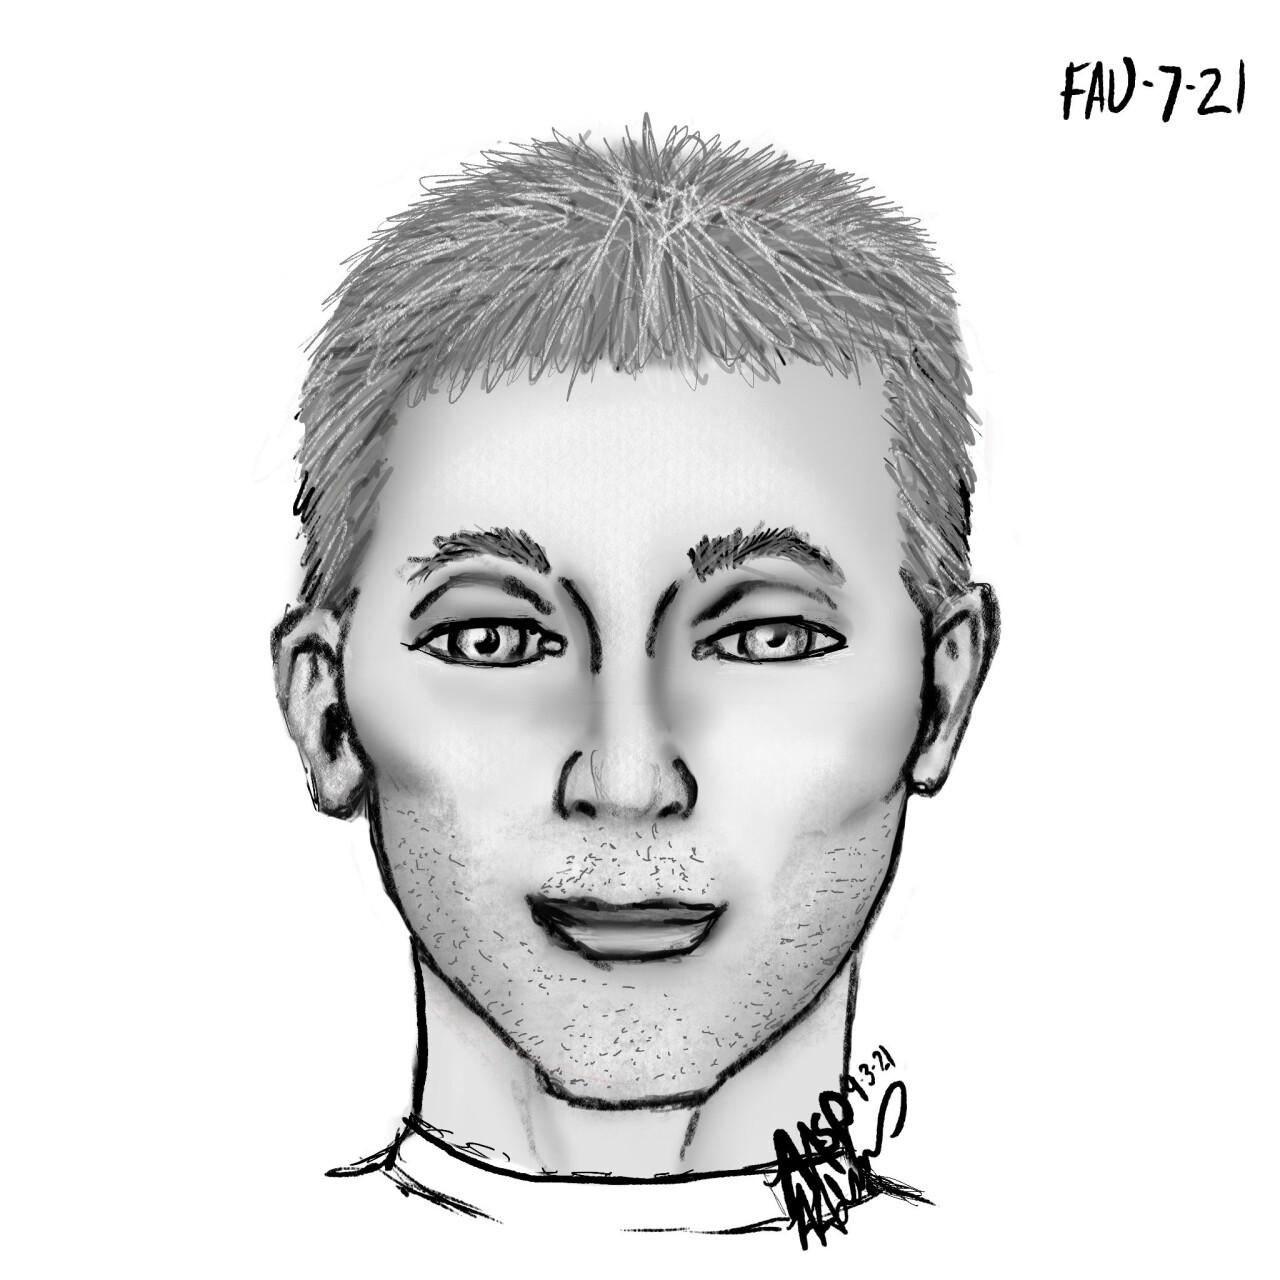 Abduction suspect.jpg